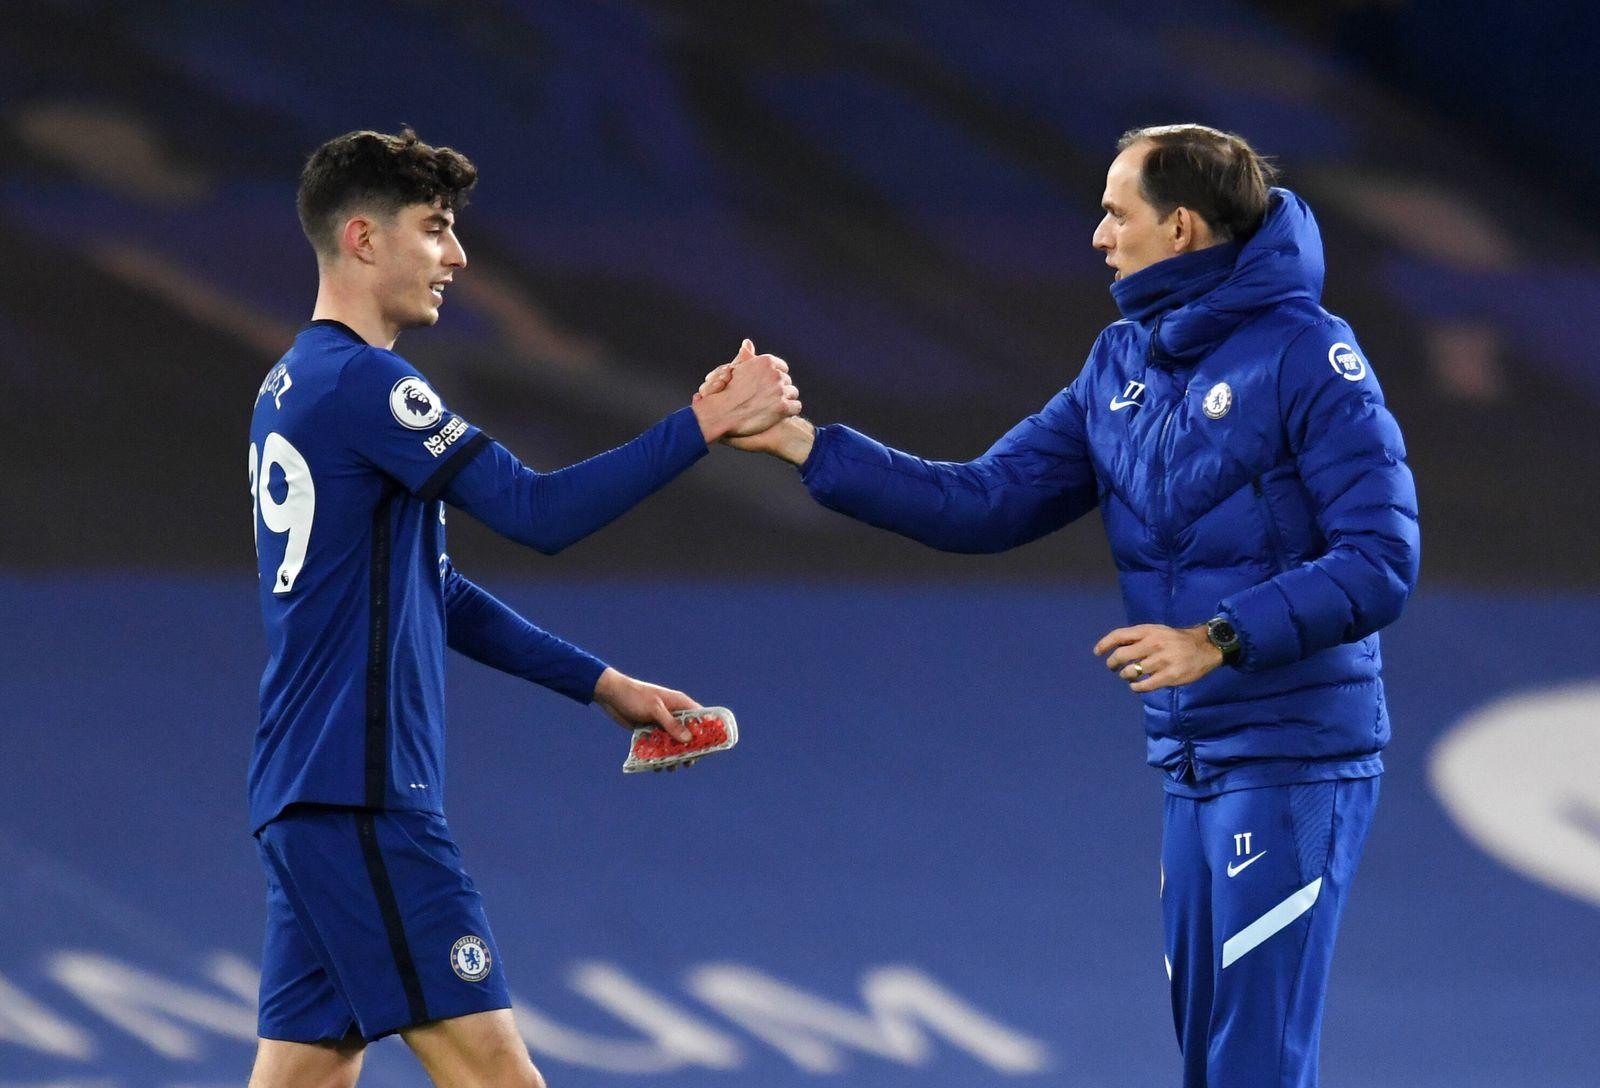 Chelsea v Everton - Premier League - Stamford Bridge Chelsea s Kai Havertz and Chelsea manager Thomas Tuchel after the